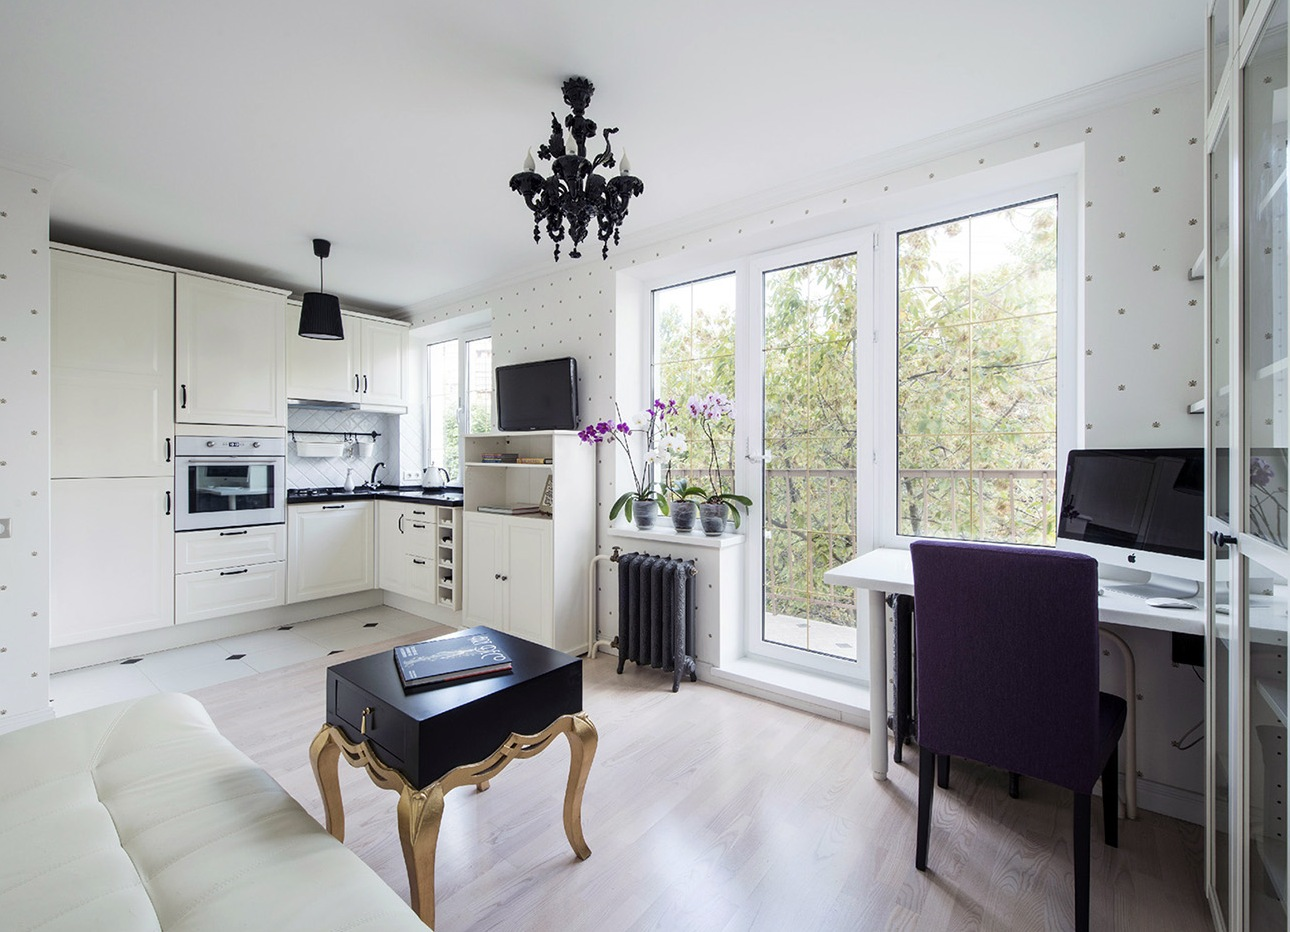 Дизайн квартиры-студии 31 кв м